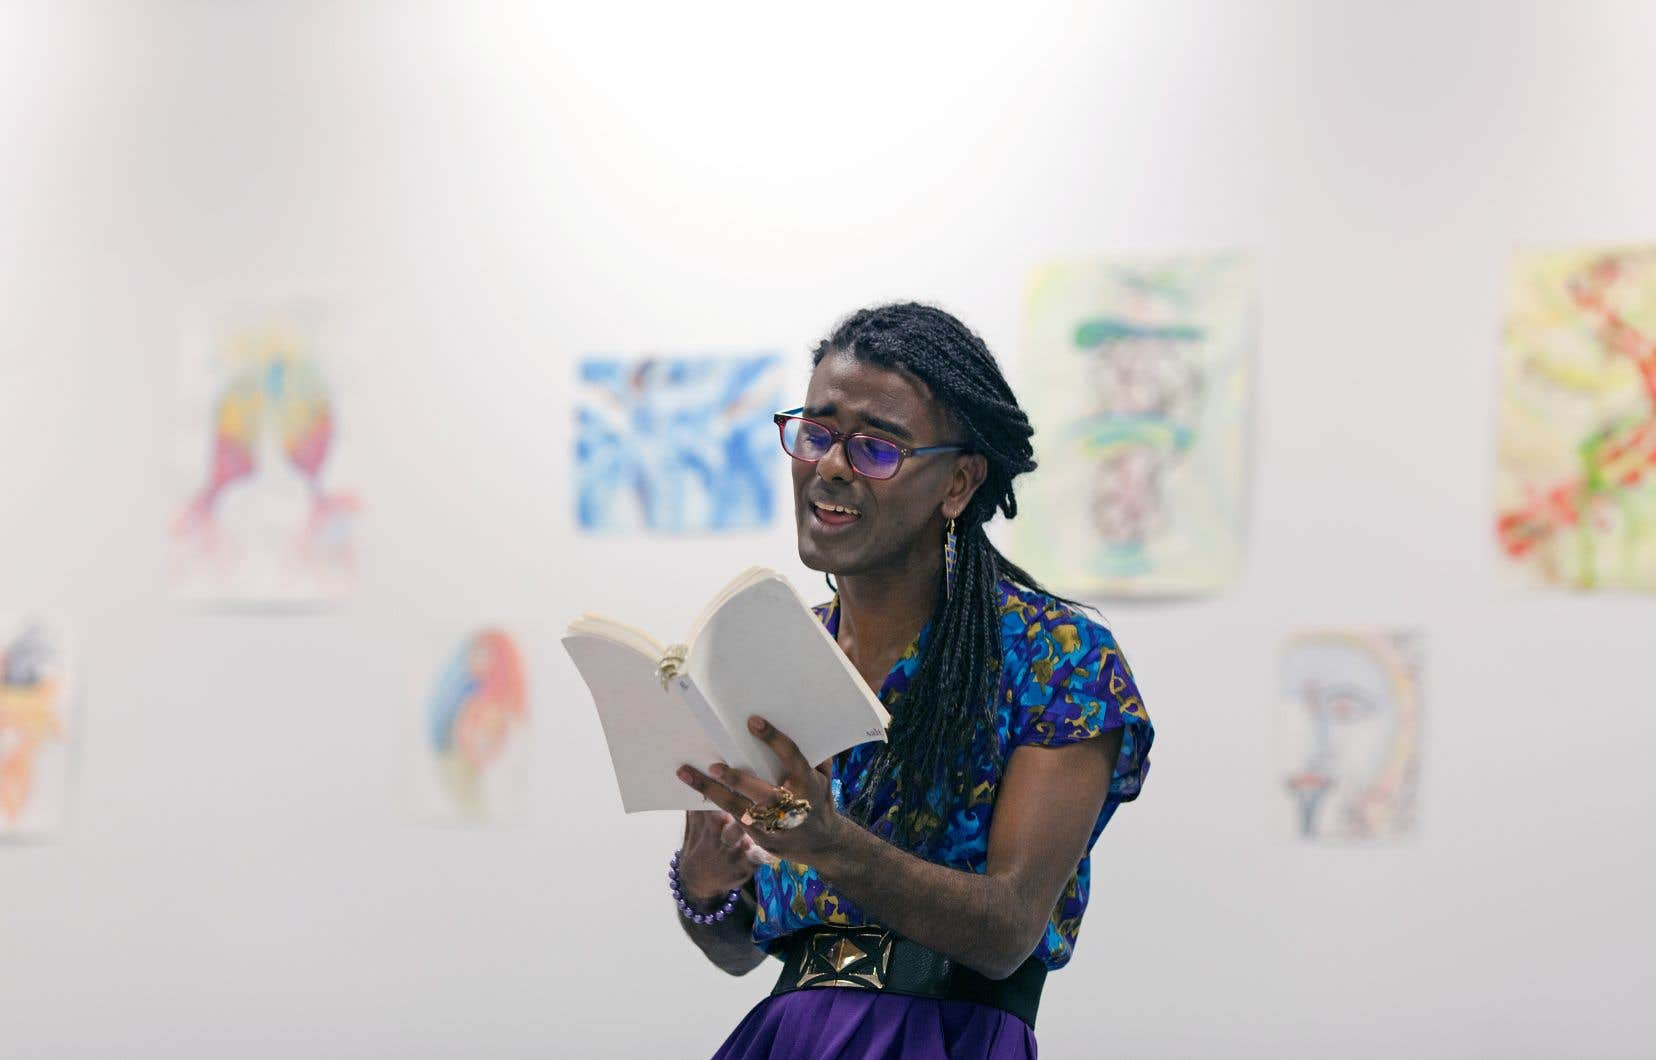 La directrice artistique de l'organisme Nos corps, nos histoires, Kama La Mackerel